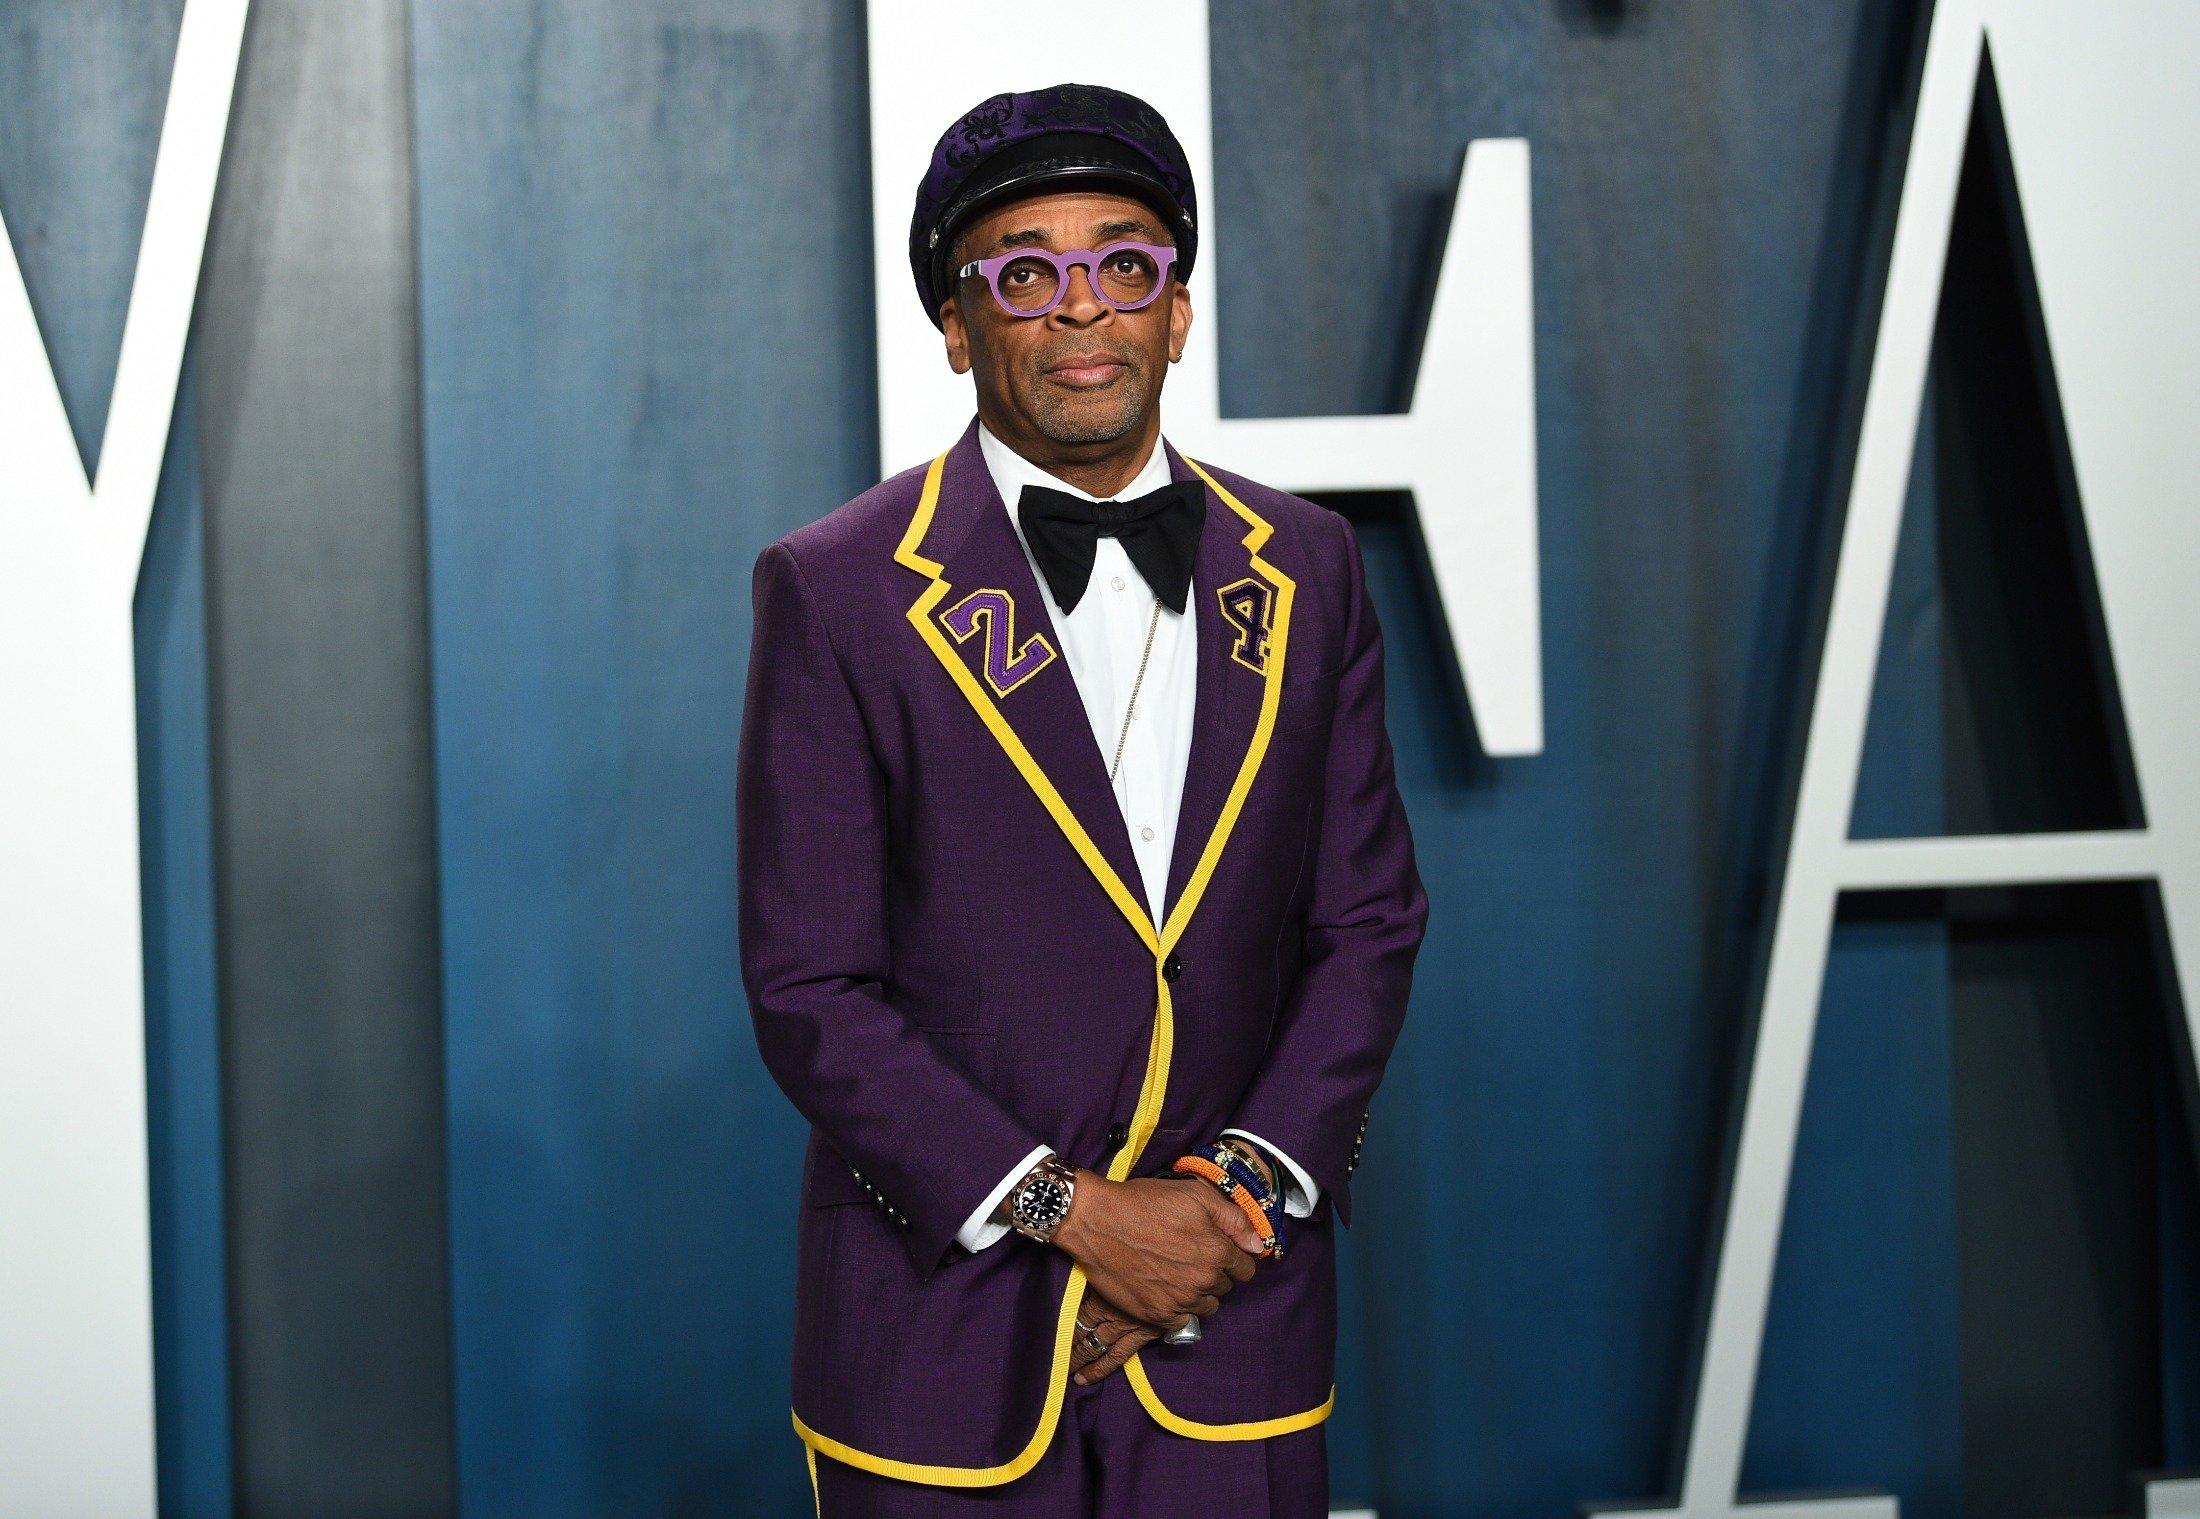 Spike Lee arrives at the Vanity Fair Oscar Party in Beverly Hills, California, U.S., Feb. 9, 2020. (AP Photo)